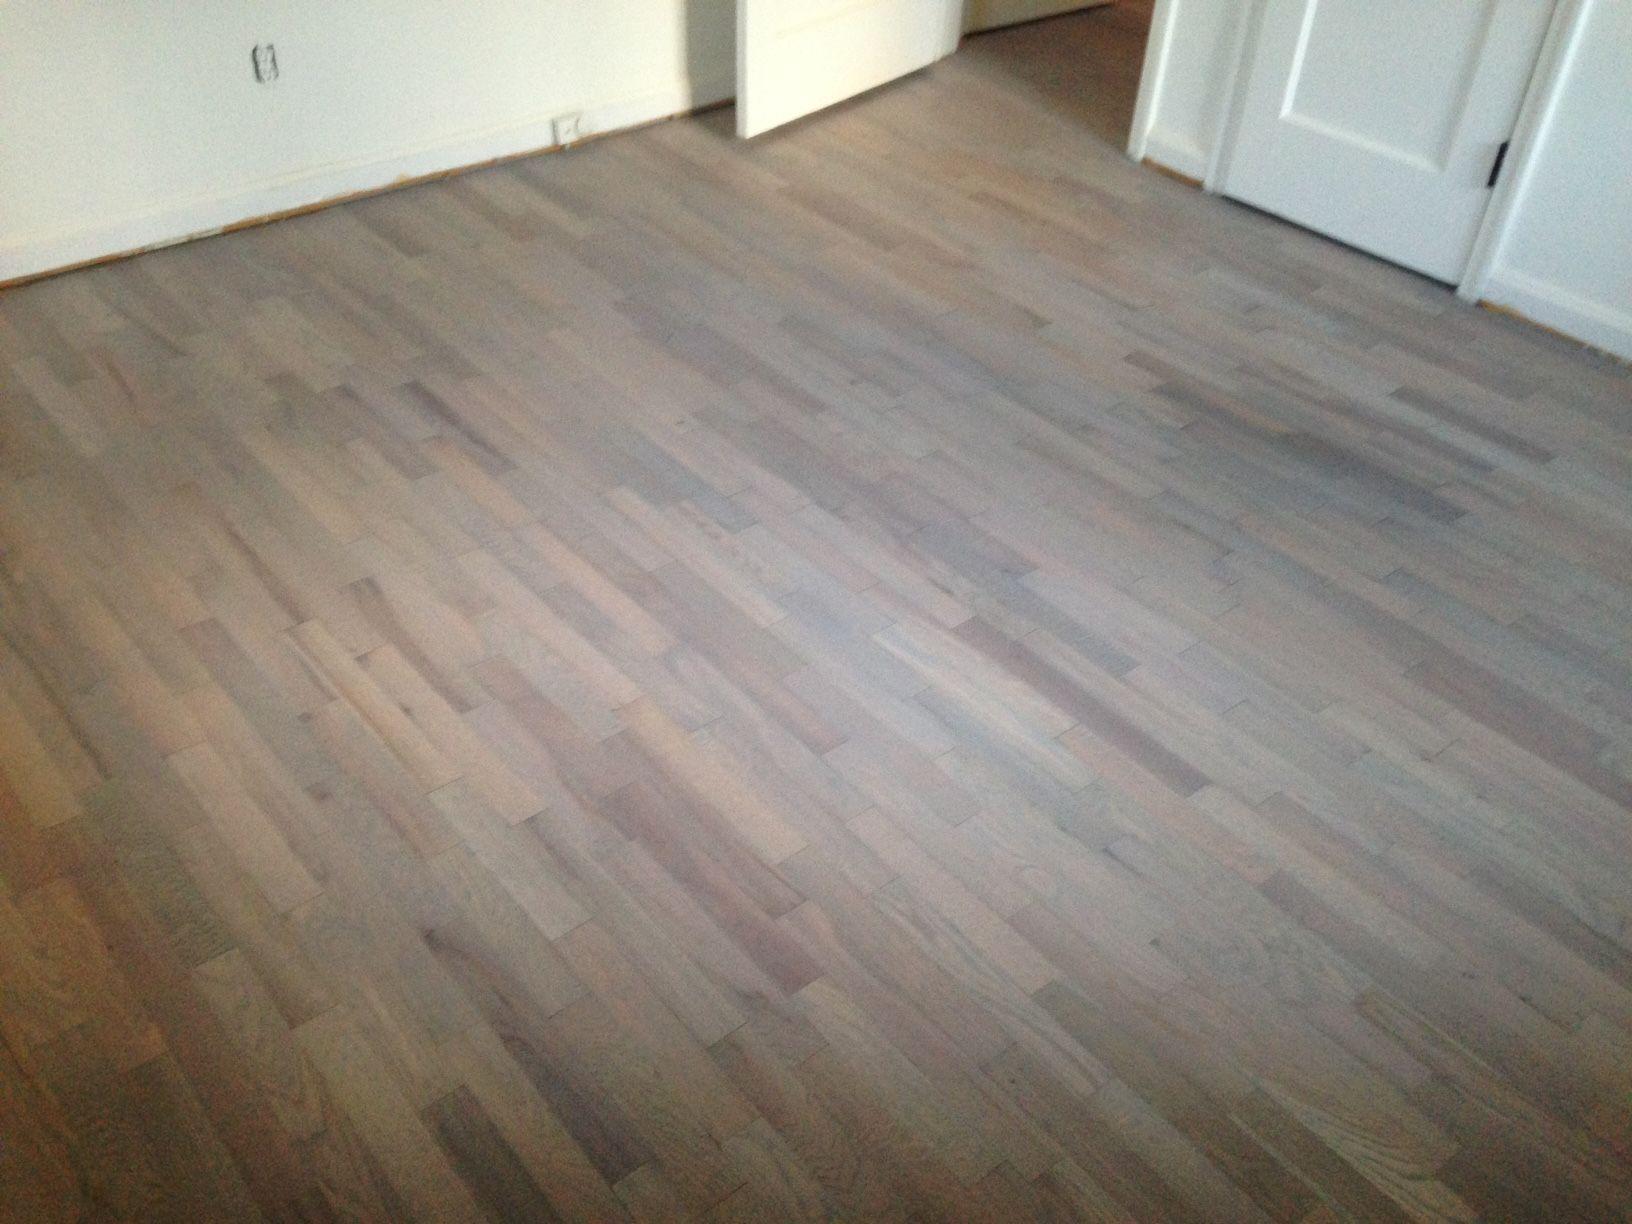 Solid Yellow Pine Wood Flooring